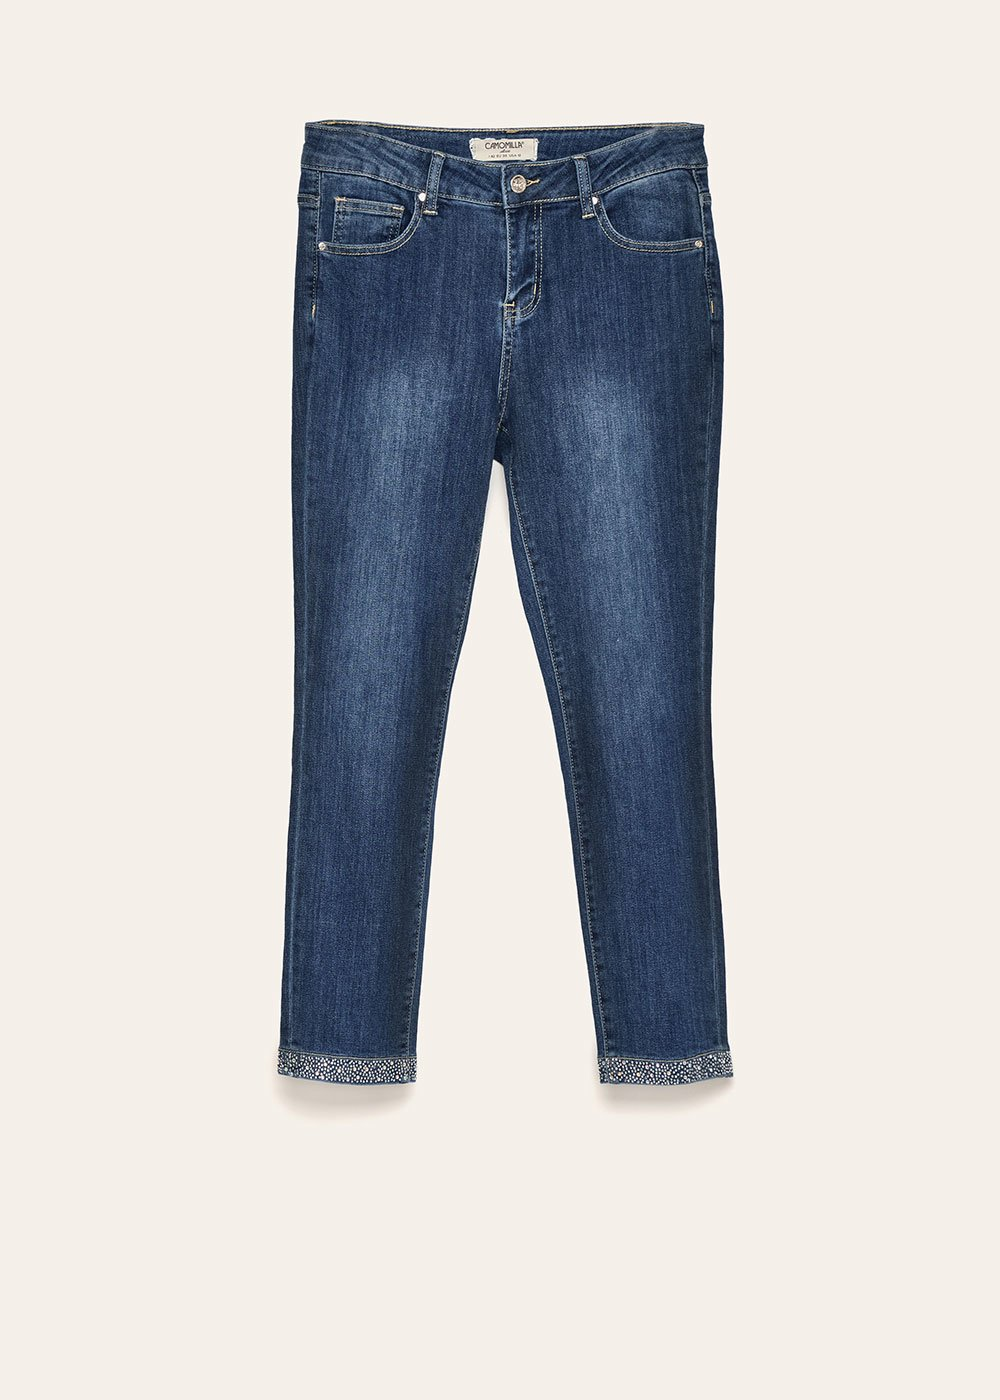 David capri pants with rhinestone hem - Dark Denim - Woman